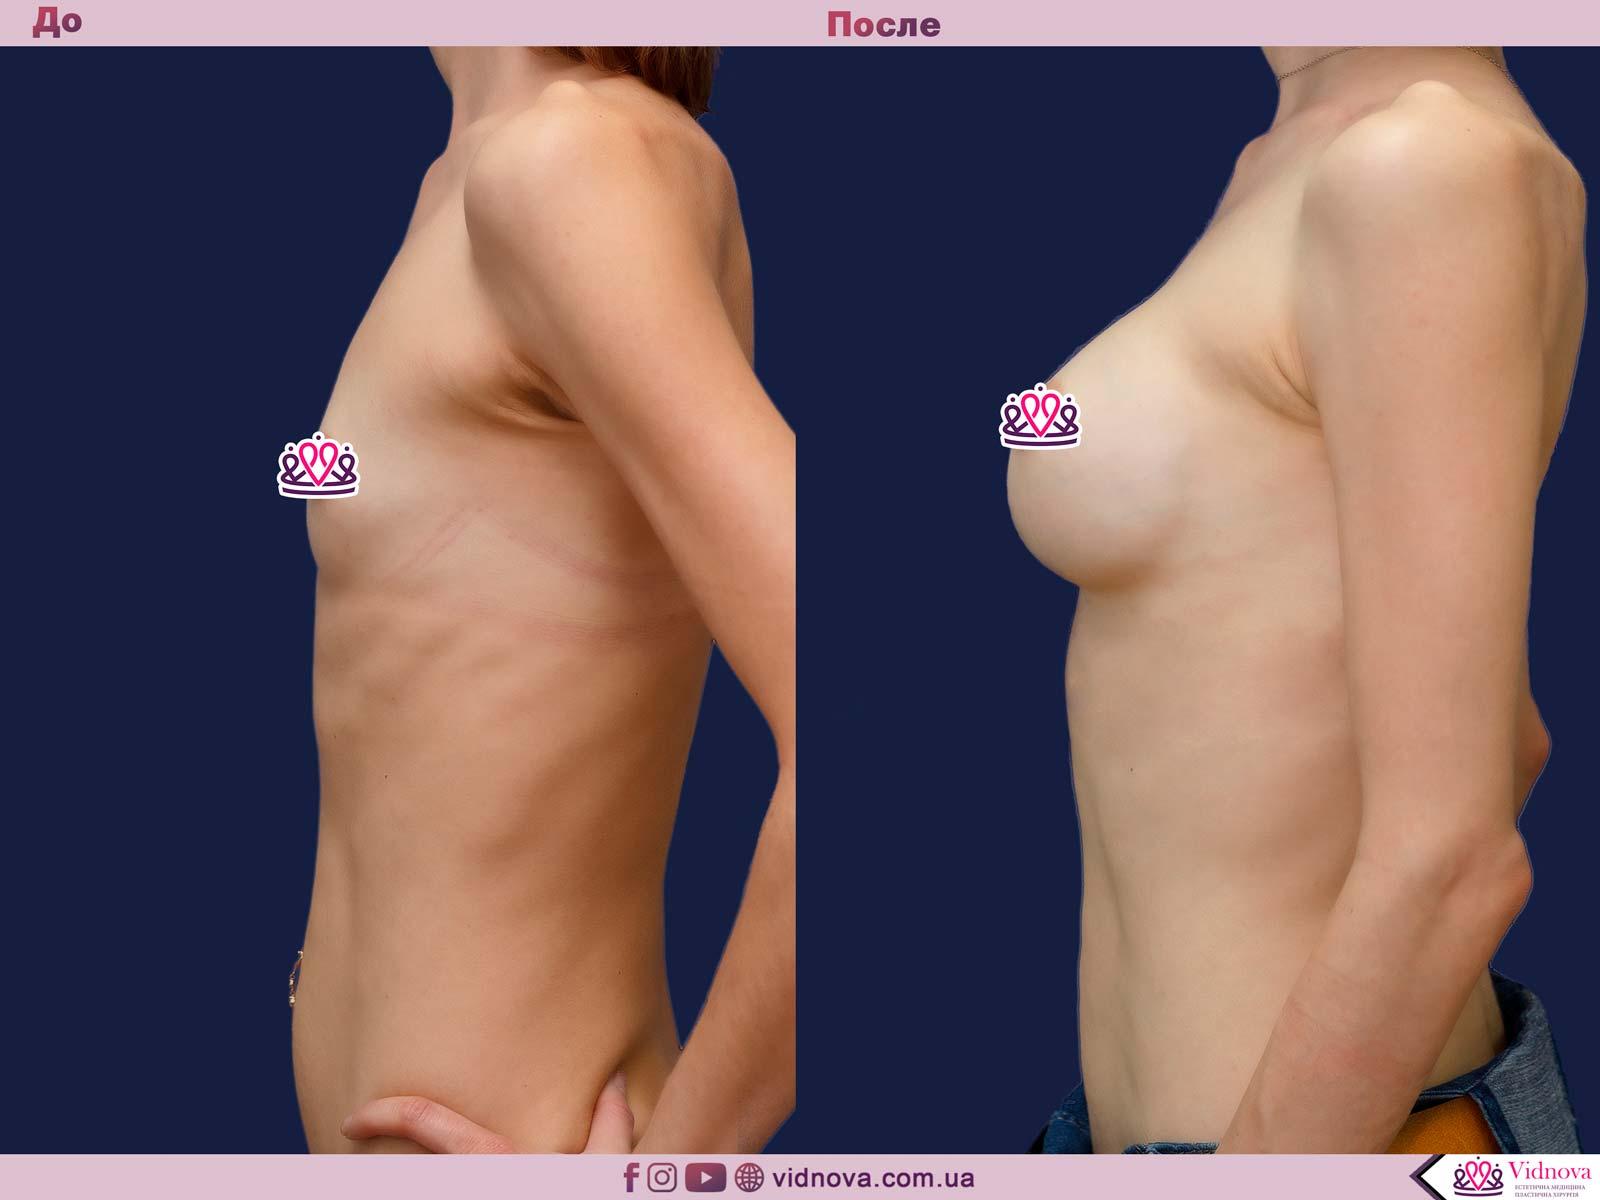 Увеличение груди: Фото ДО и ПОСЛЕ - Пример №65-3 - Клиника Vidnova